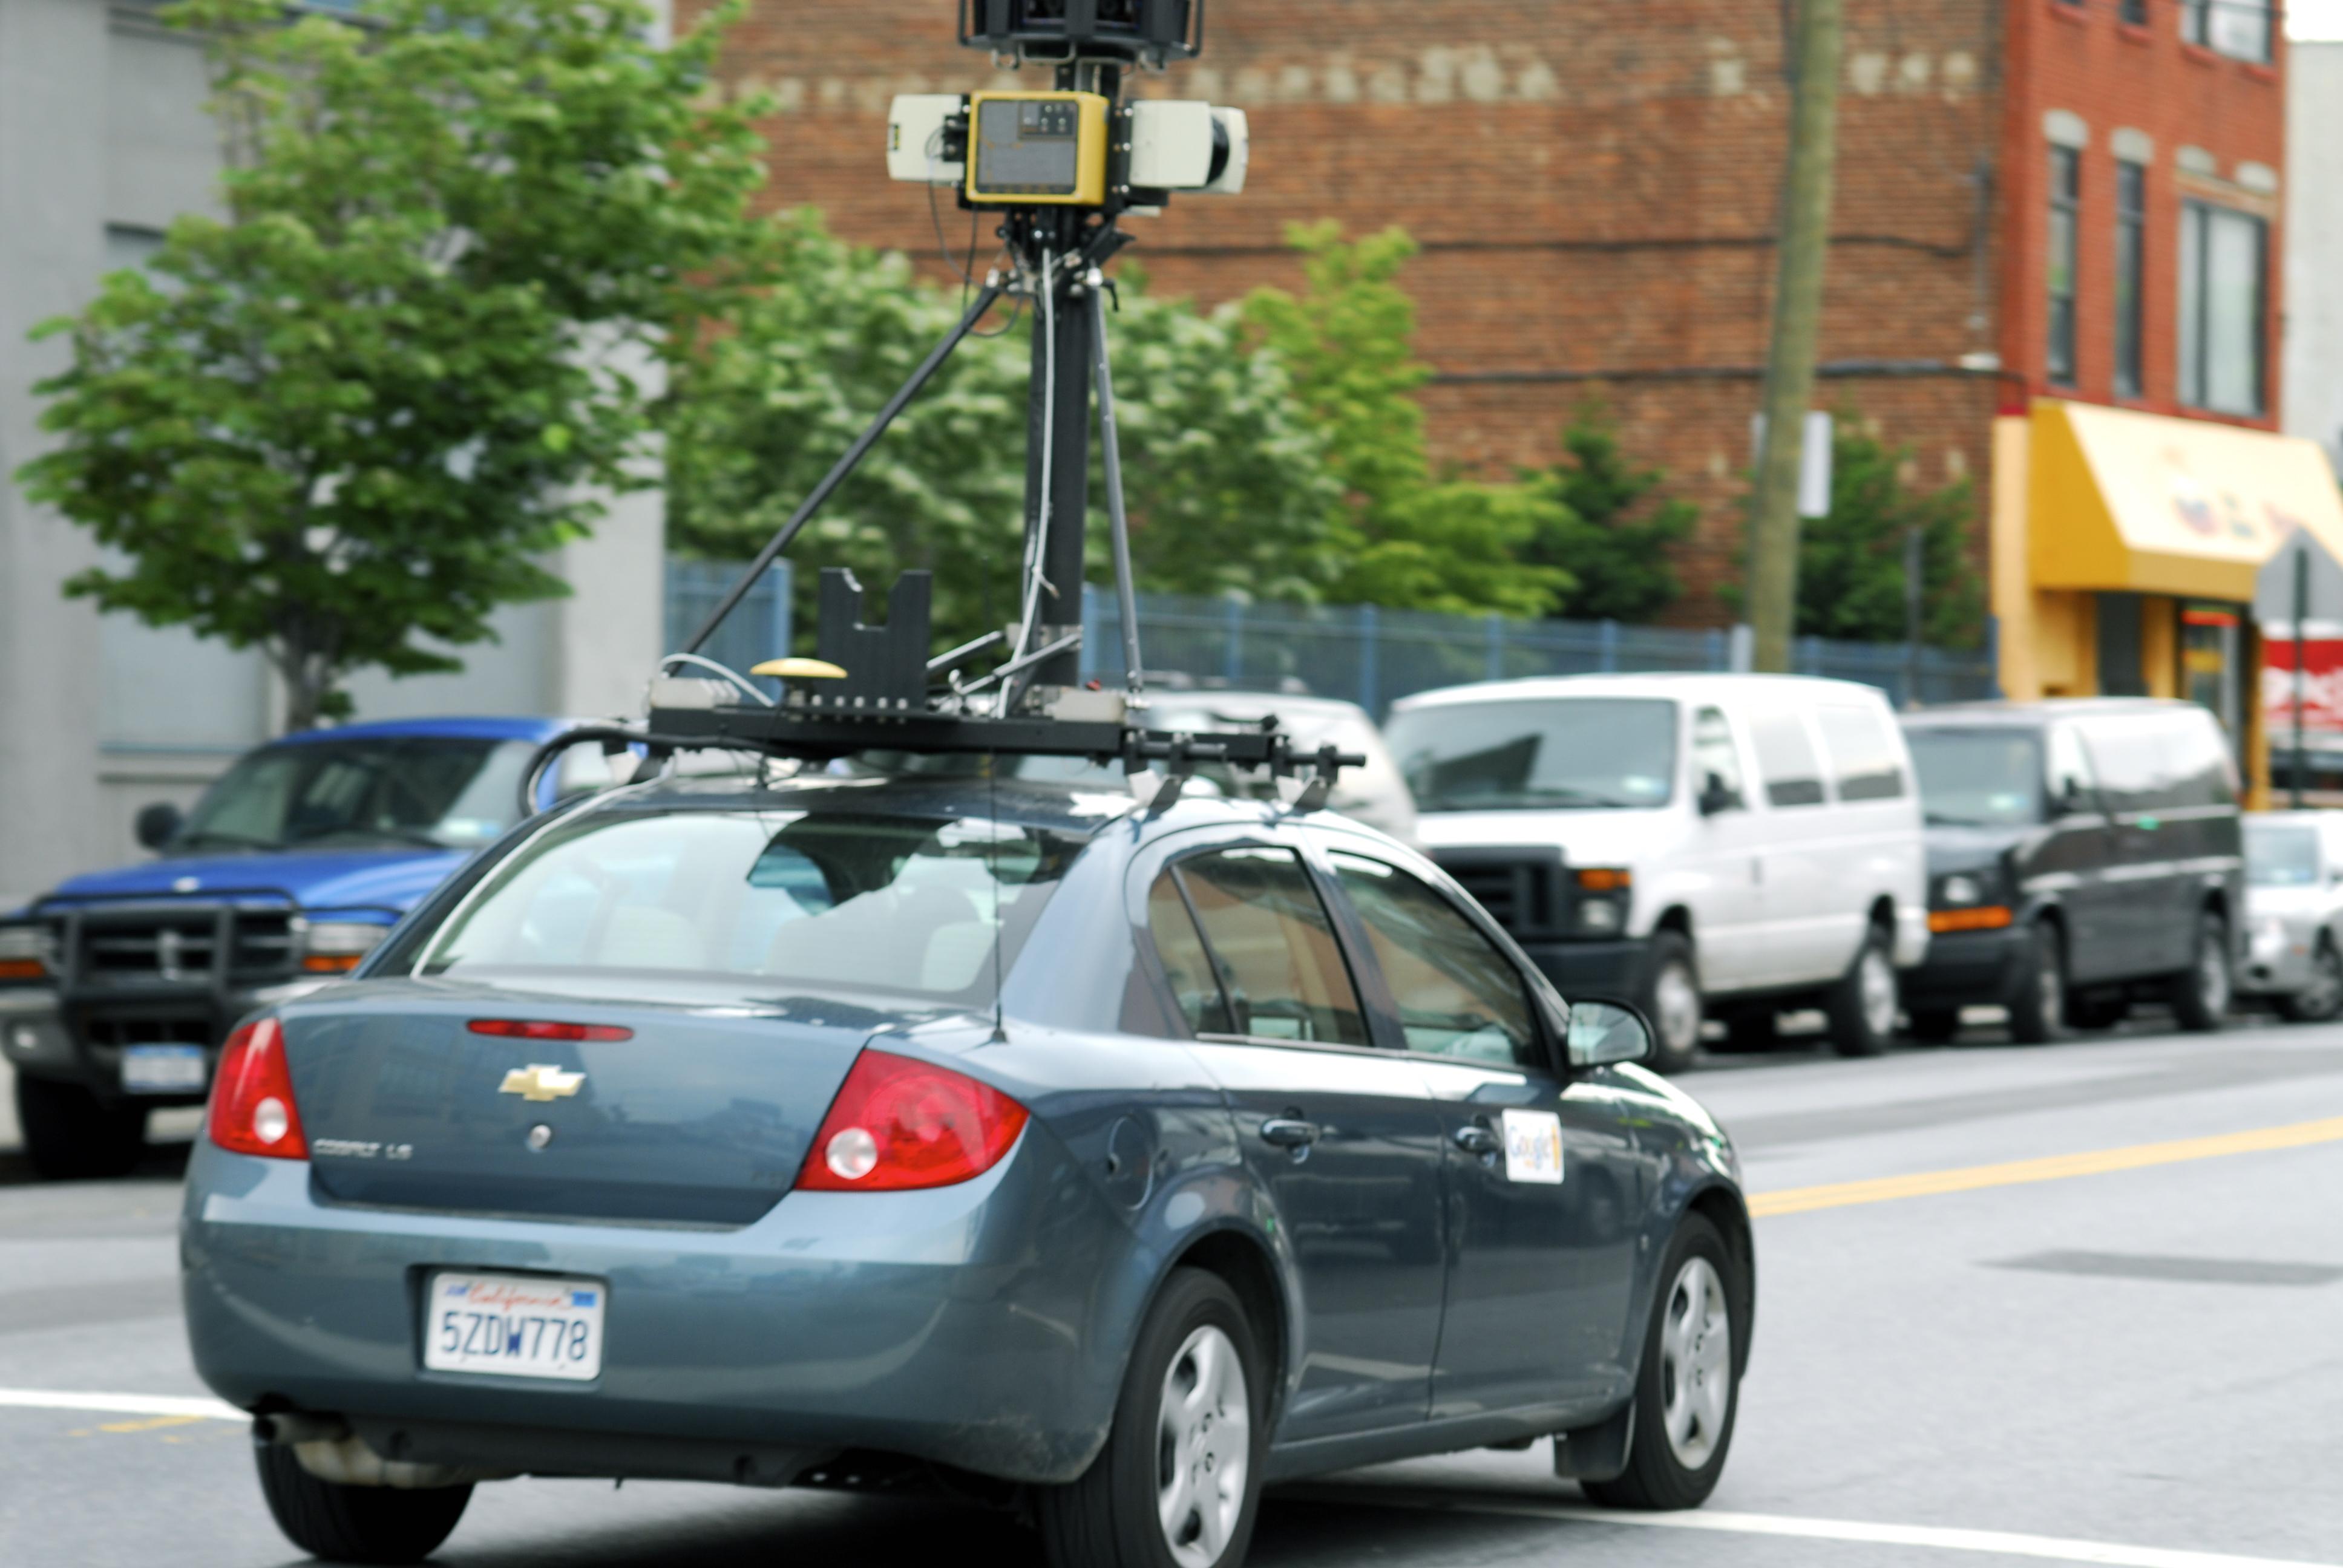 File:Google Street View Car in Hunters Point, Queens.jpg - Wikimedia ...